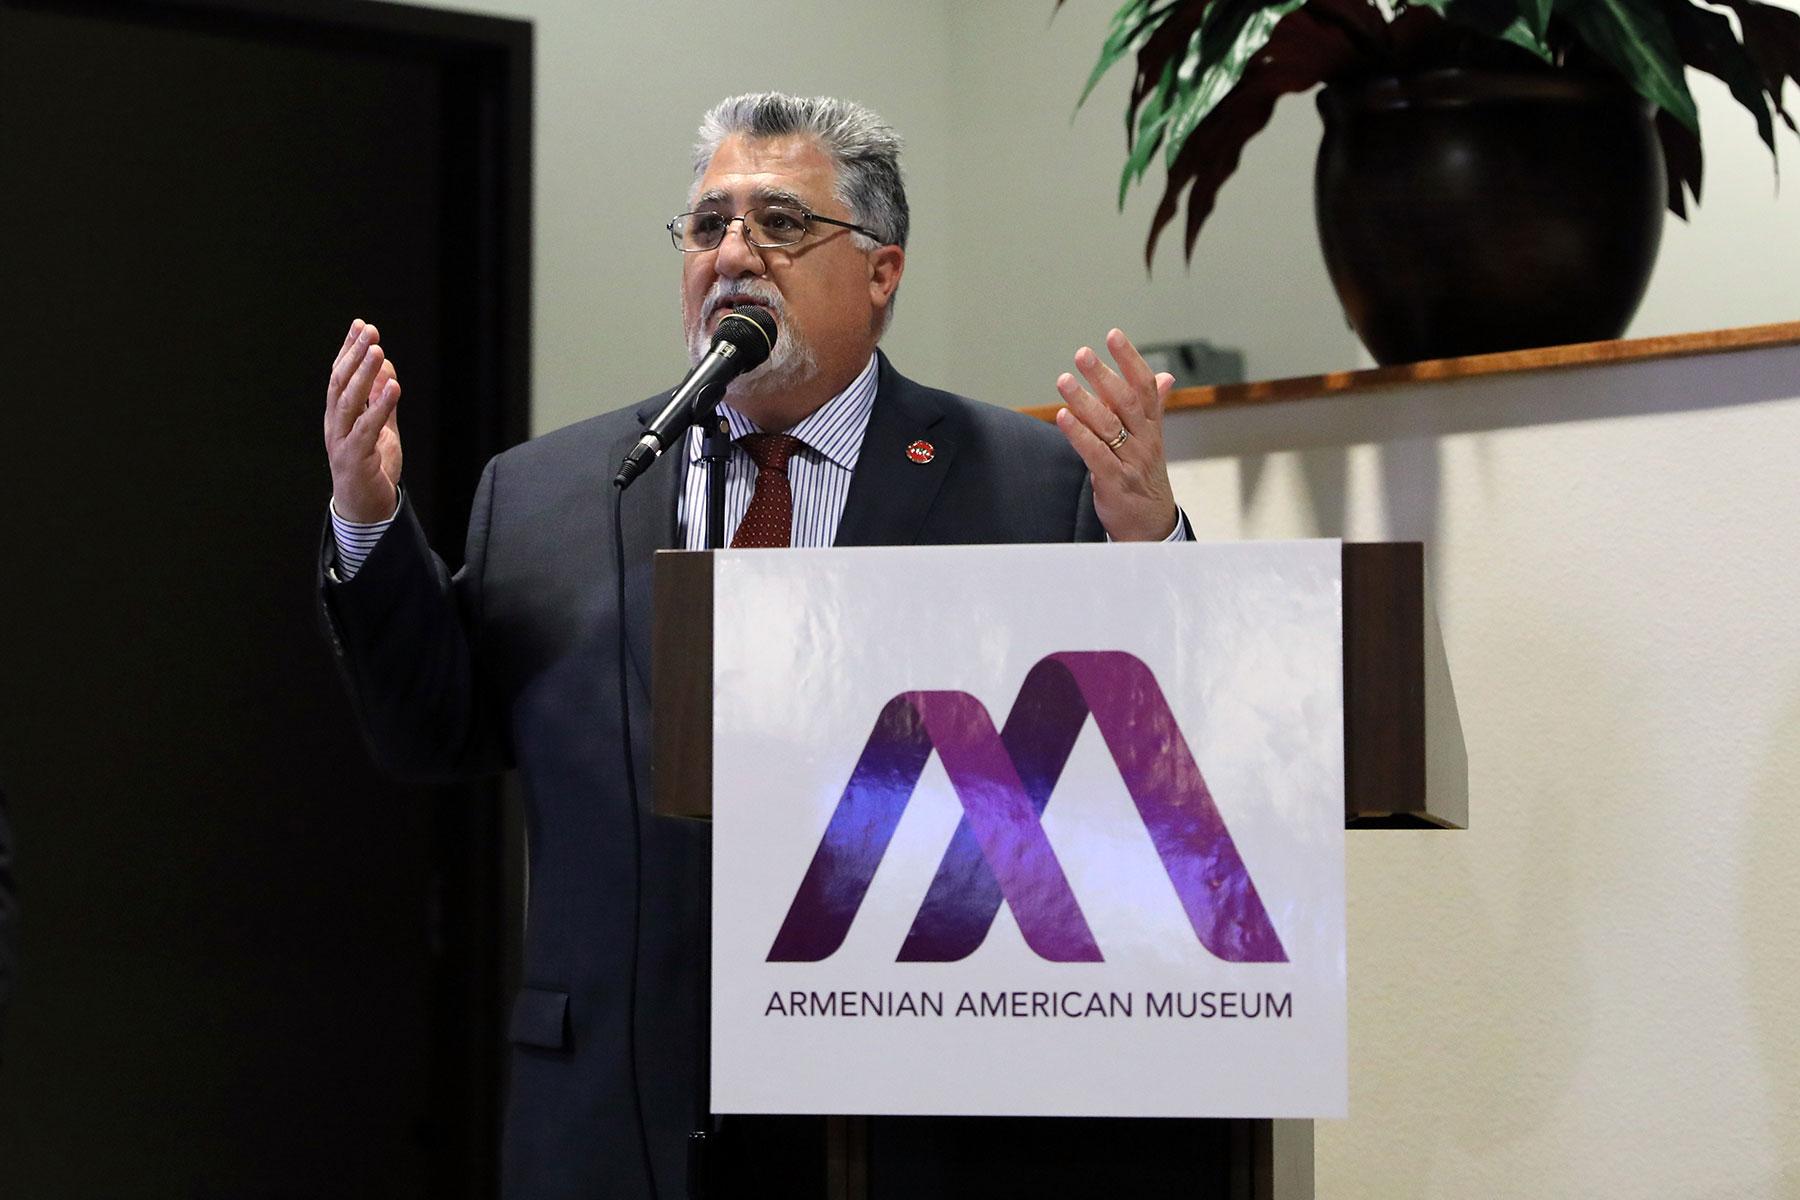 Senator Anthony J. Portantino Addresses Audience at Armenian American Museum Community Meeting